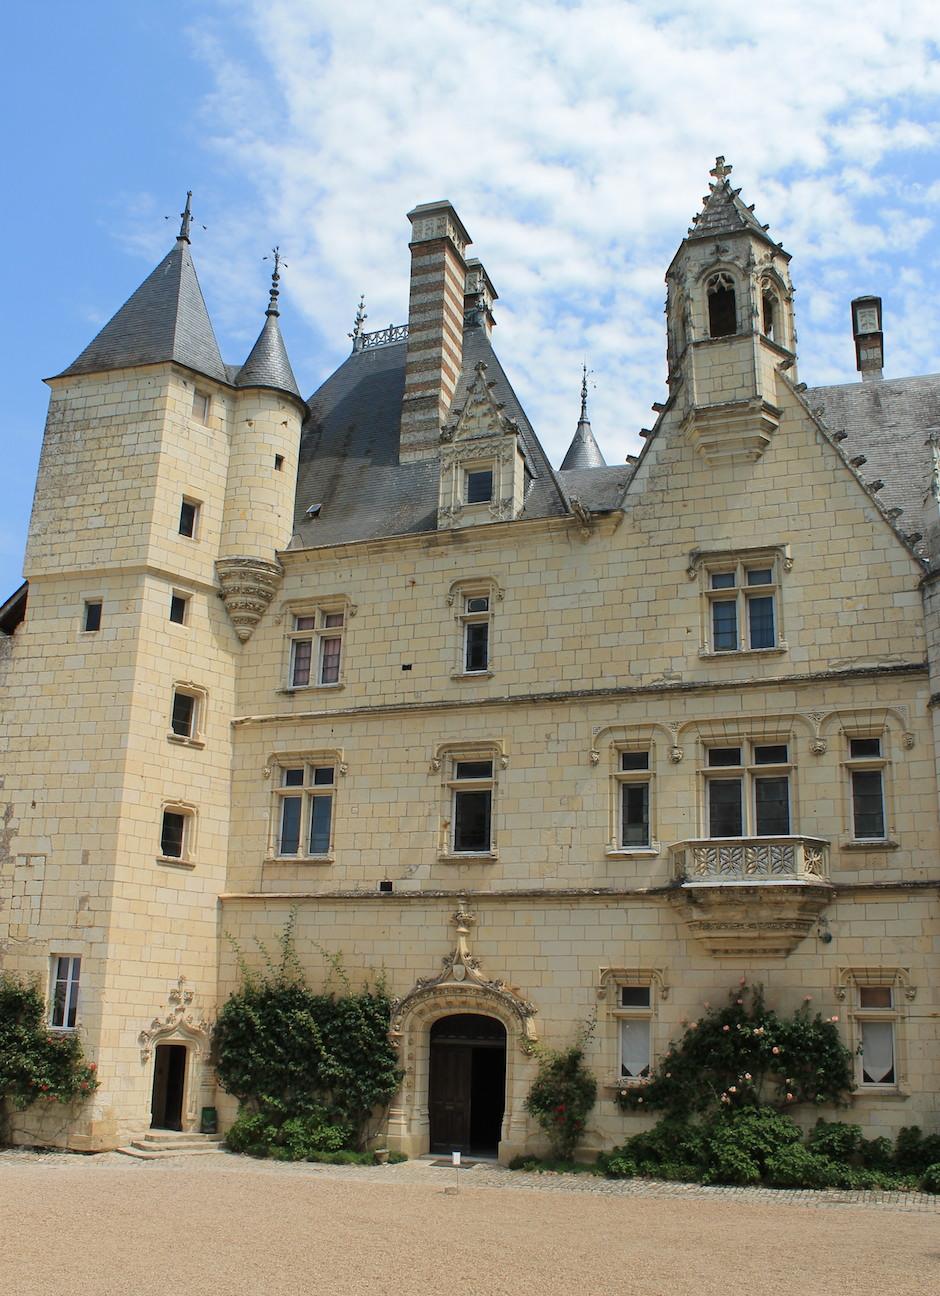 chateau d 39 uss kim kardashians hochzeit im m rchenschloss. Black Bedroom Furniture Sets. Home Design Ideas